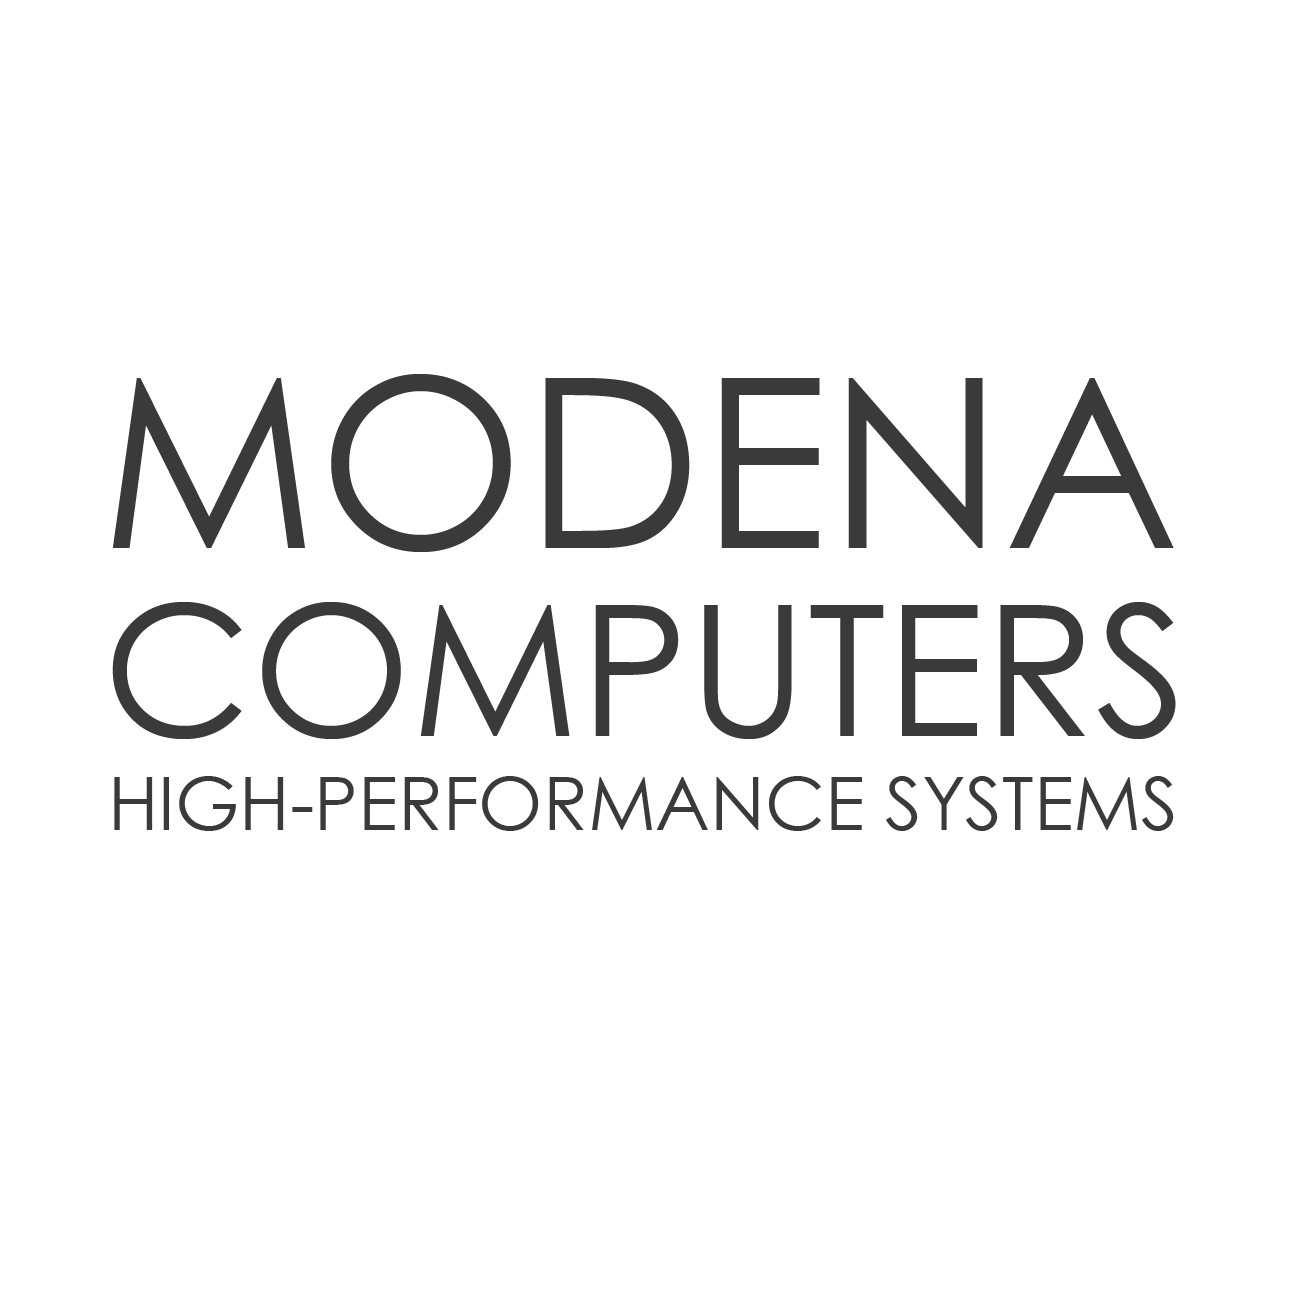 Modena Computers